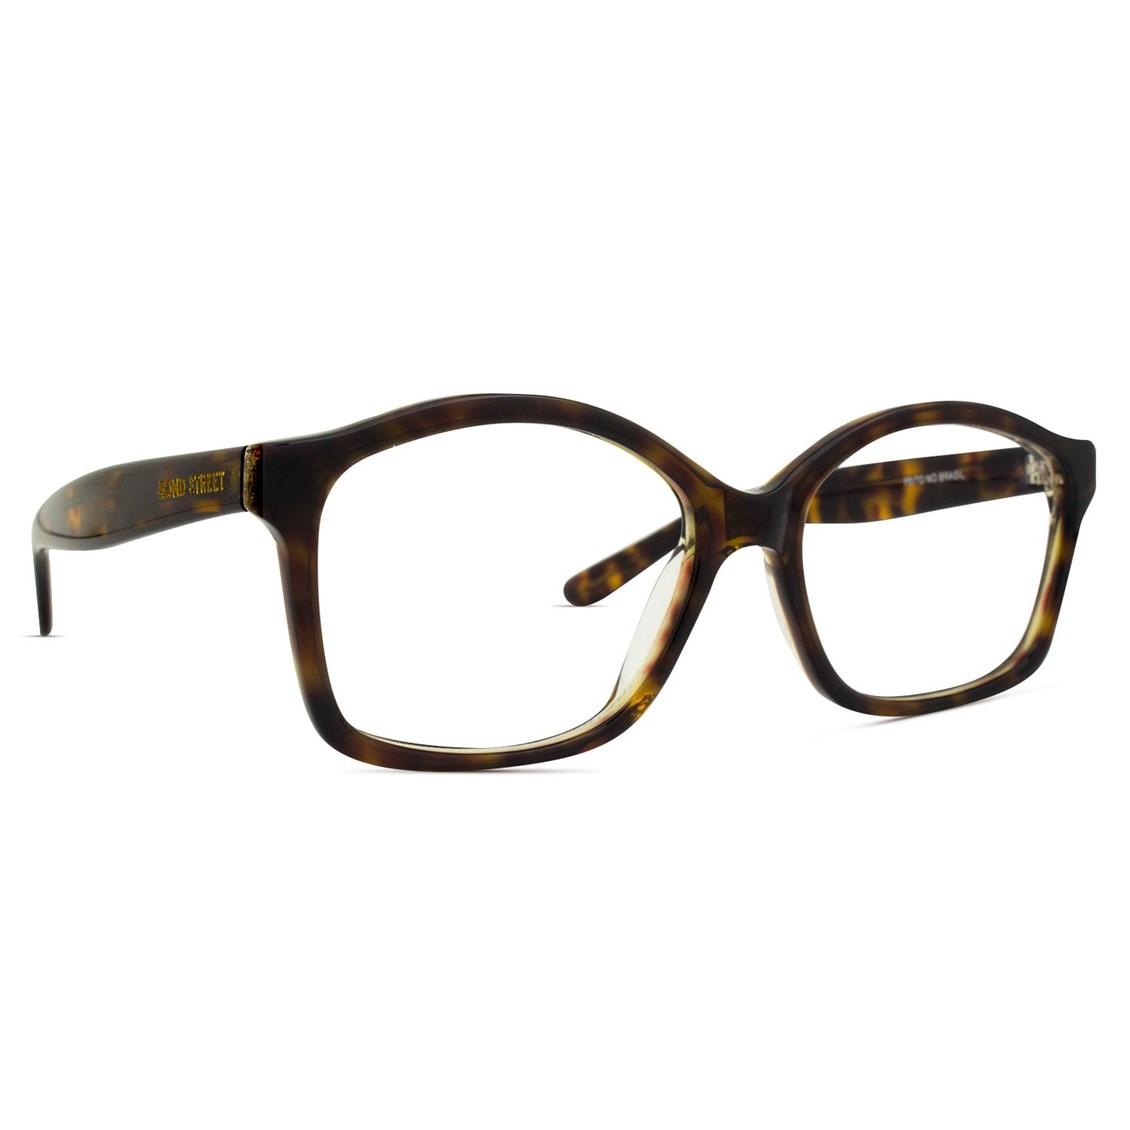 Óculos de Grau Bond Street Trafalgar 9045 002-54